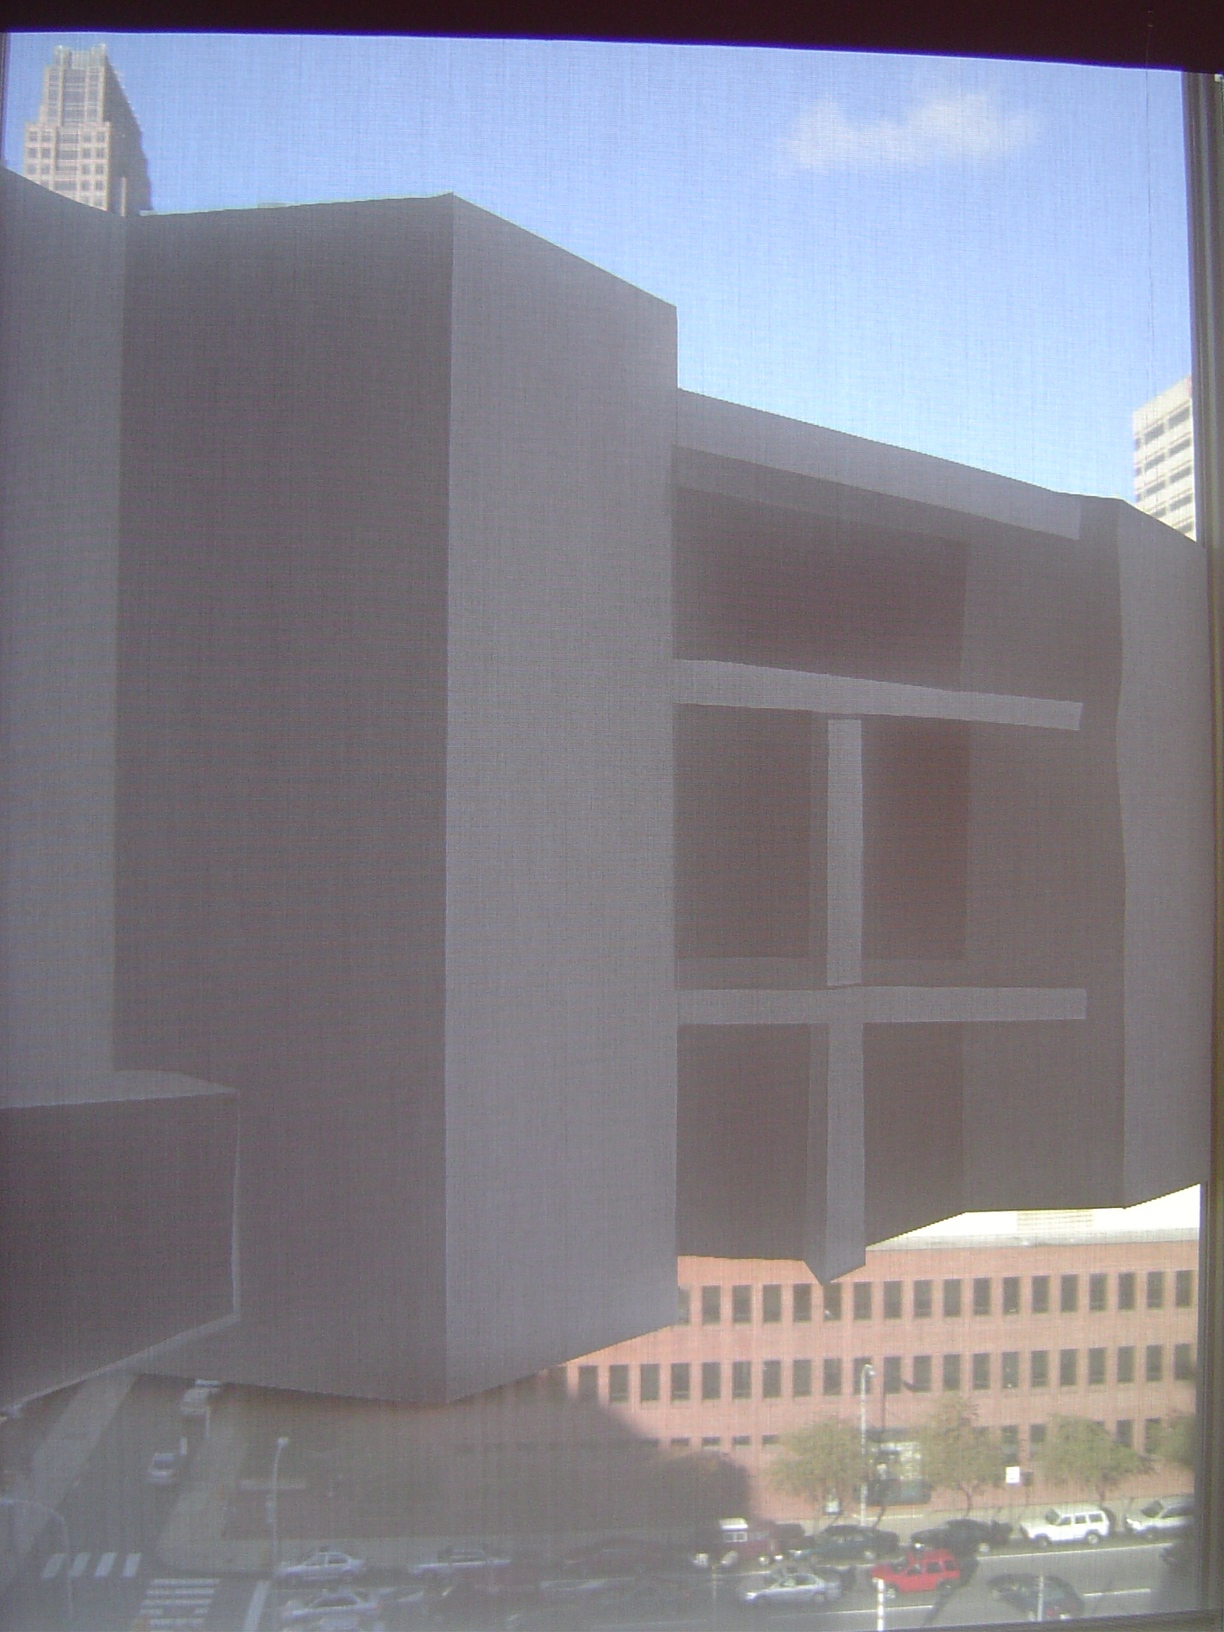 HALLWAYdetail.jpg